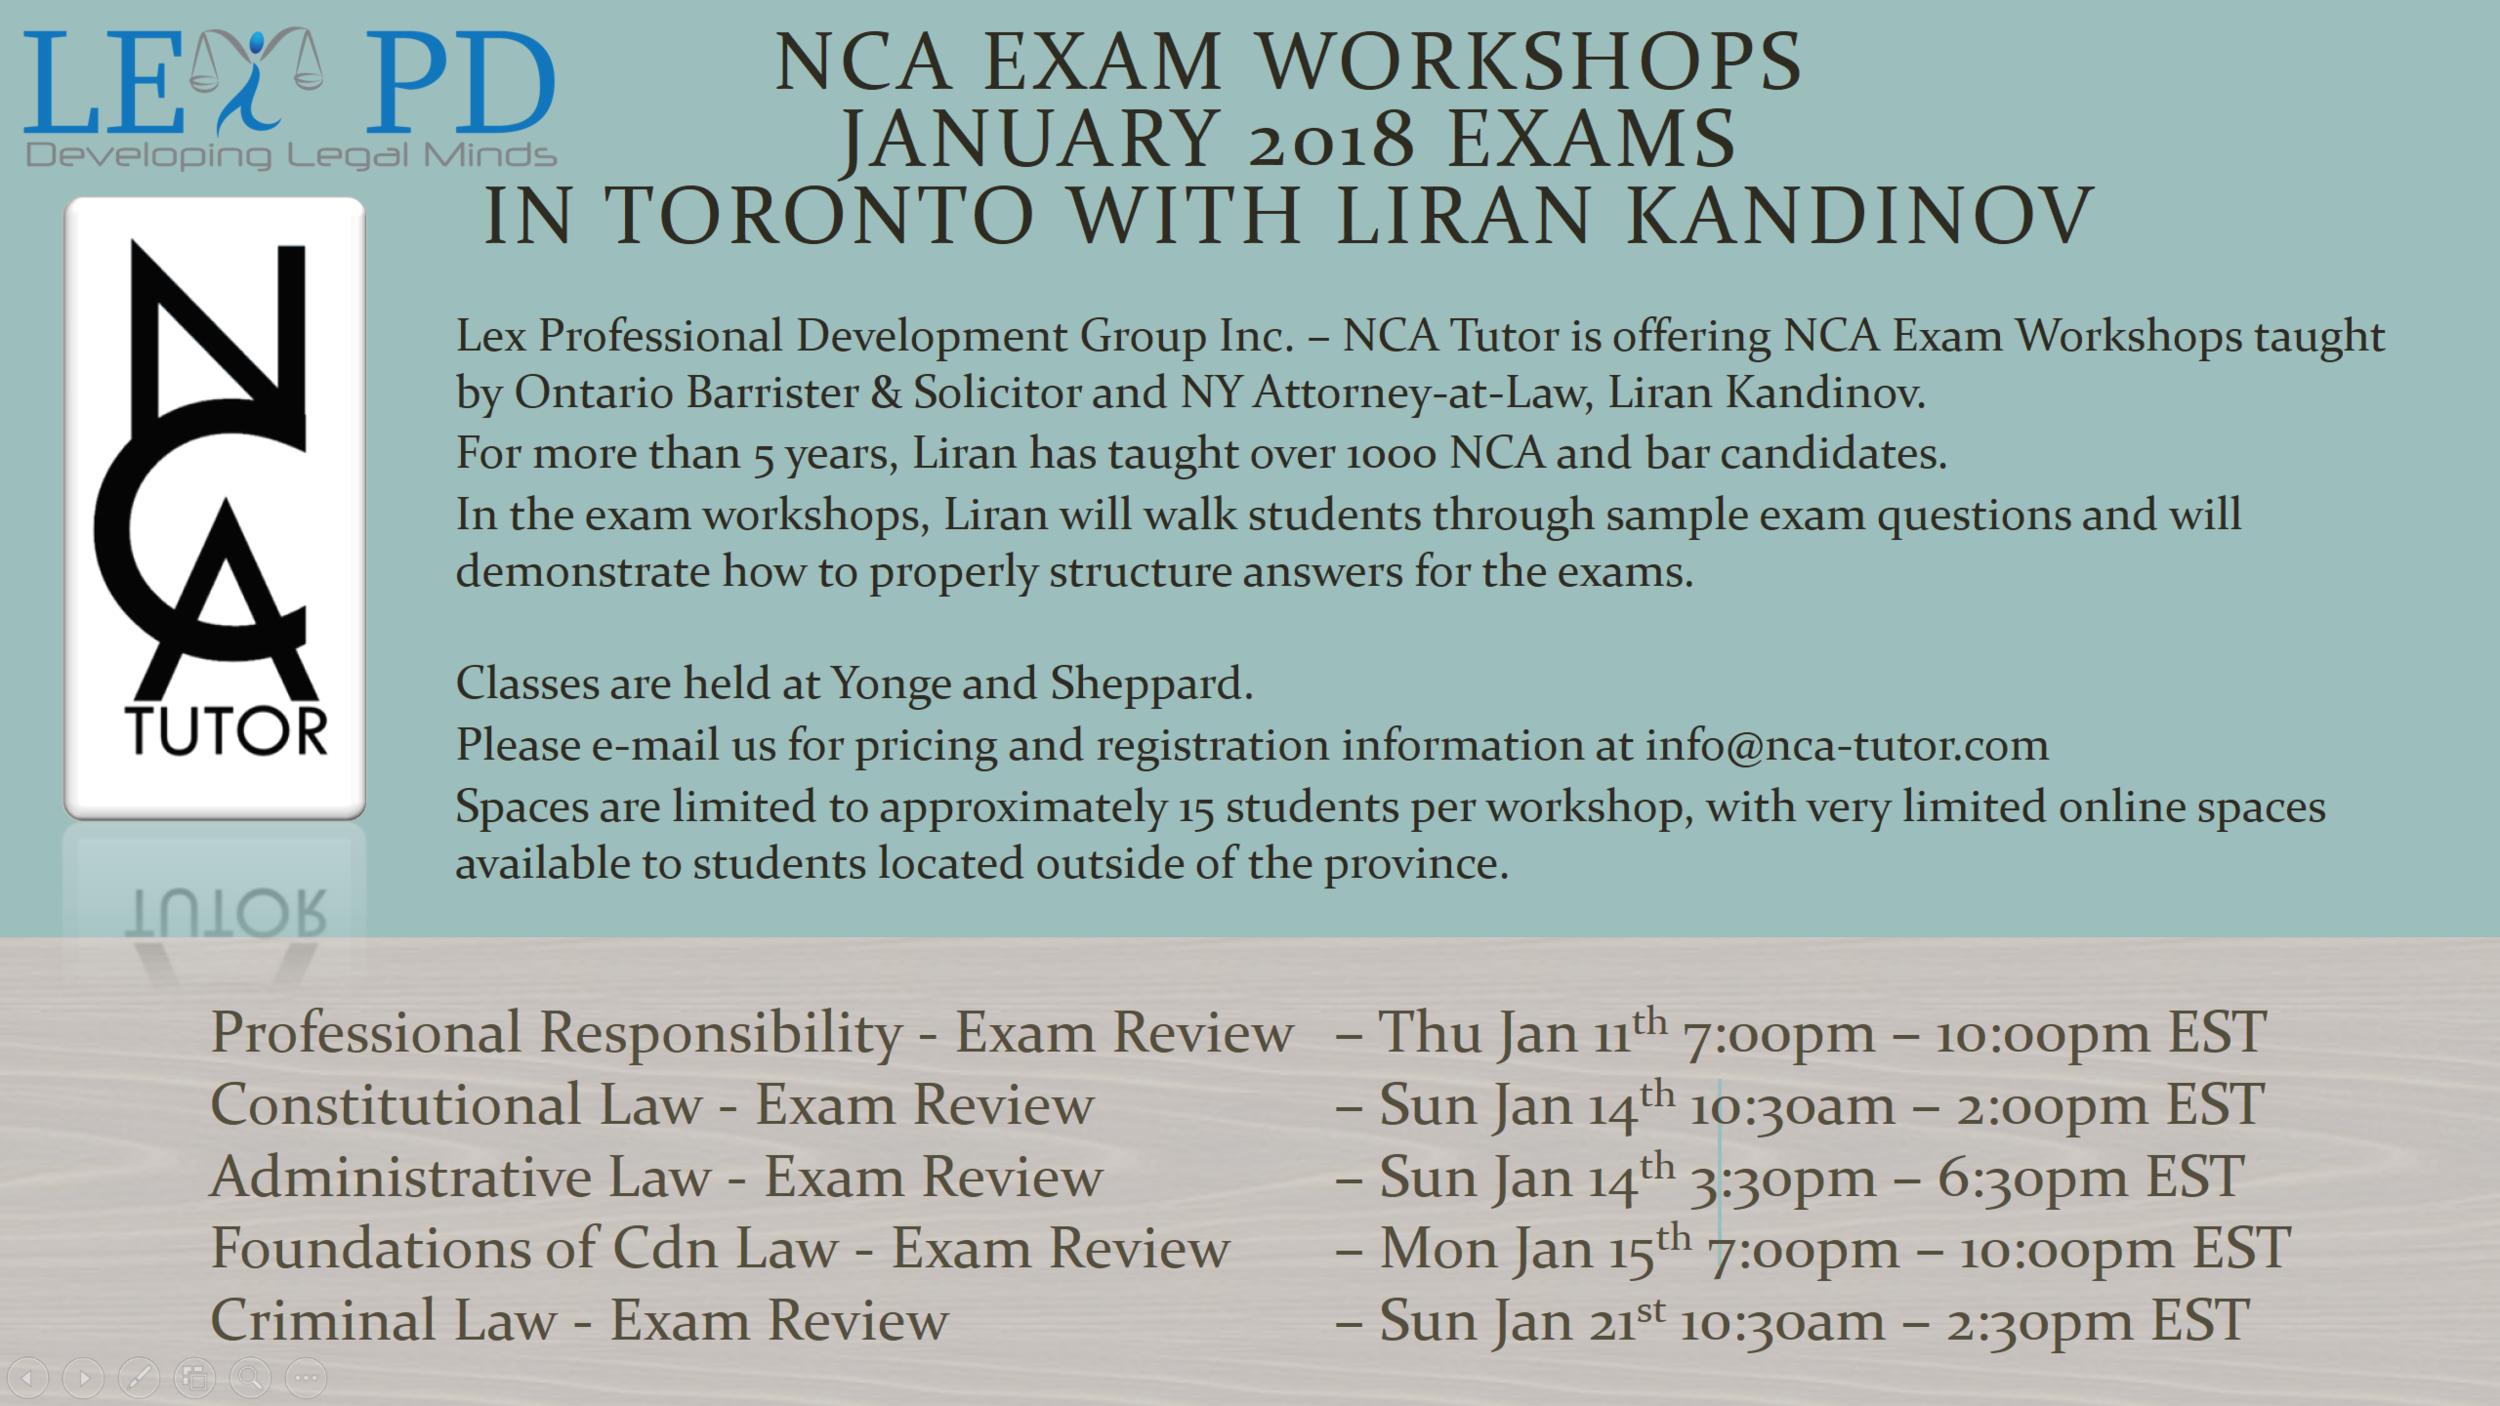 Exam Workshops taught by Liran Kandinov - January 2018 NCA Exams